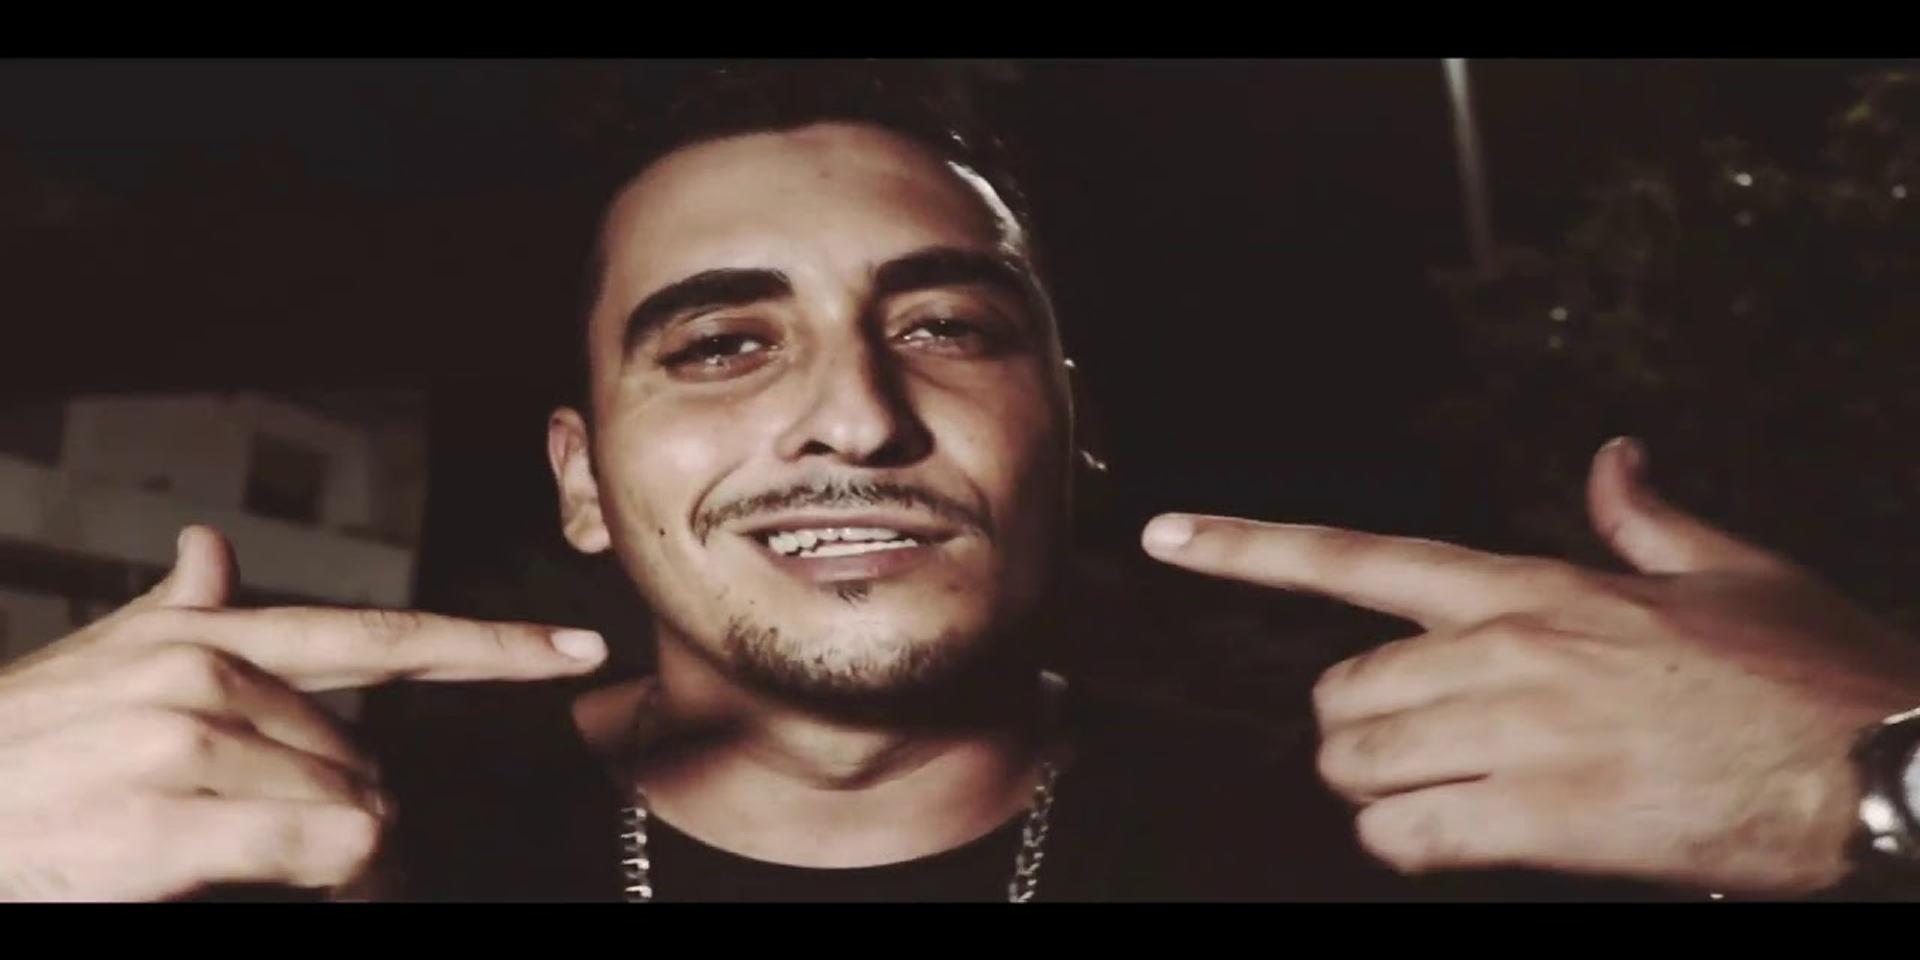 Whats wrong (REAL FAVELA CUT) Kaos Mc -Tito Jackson -Alex boye - Bull Dogg